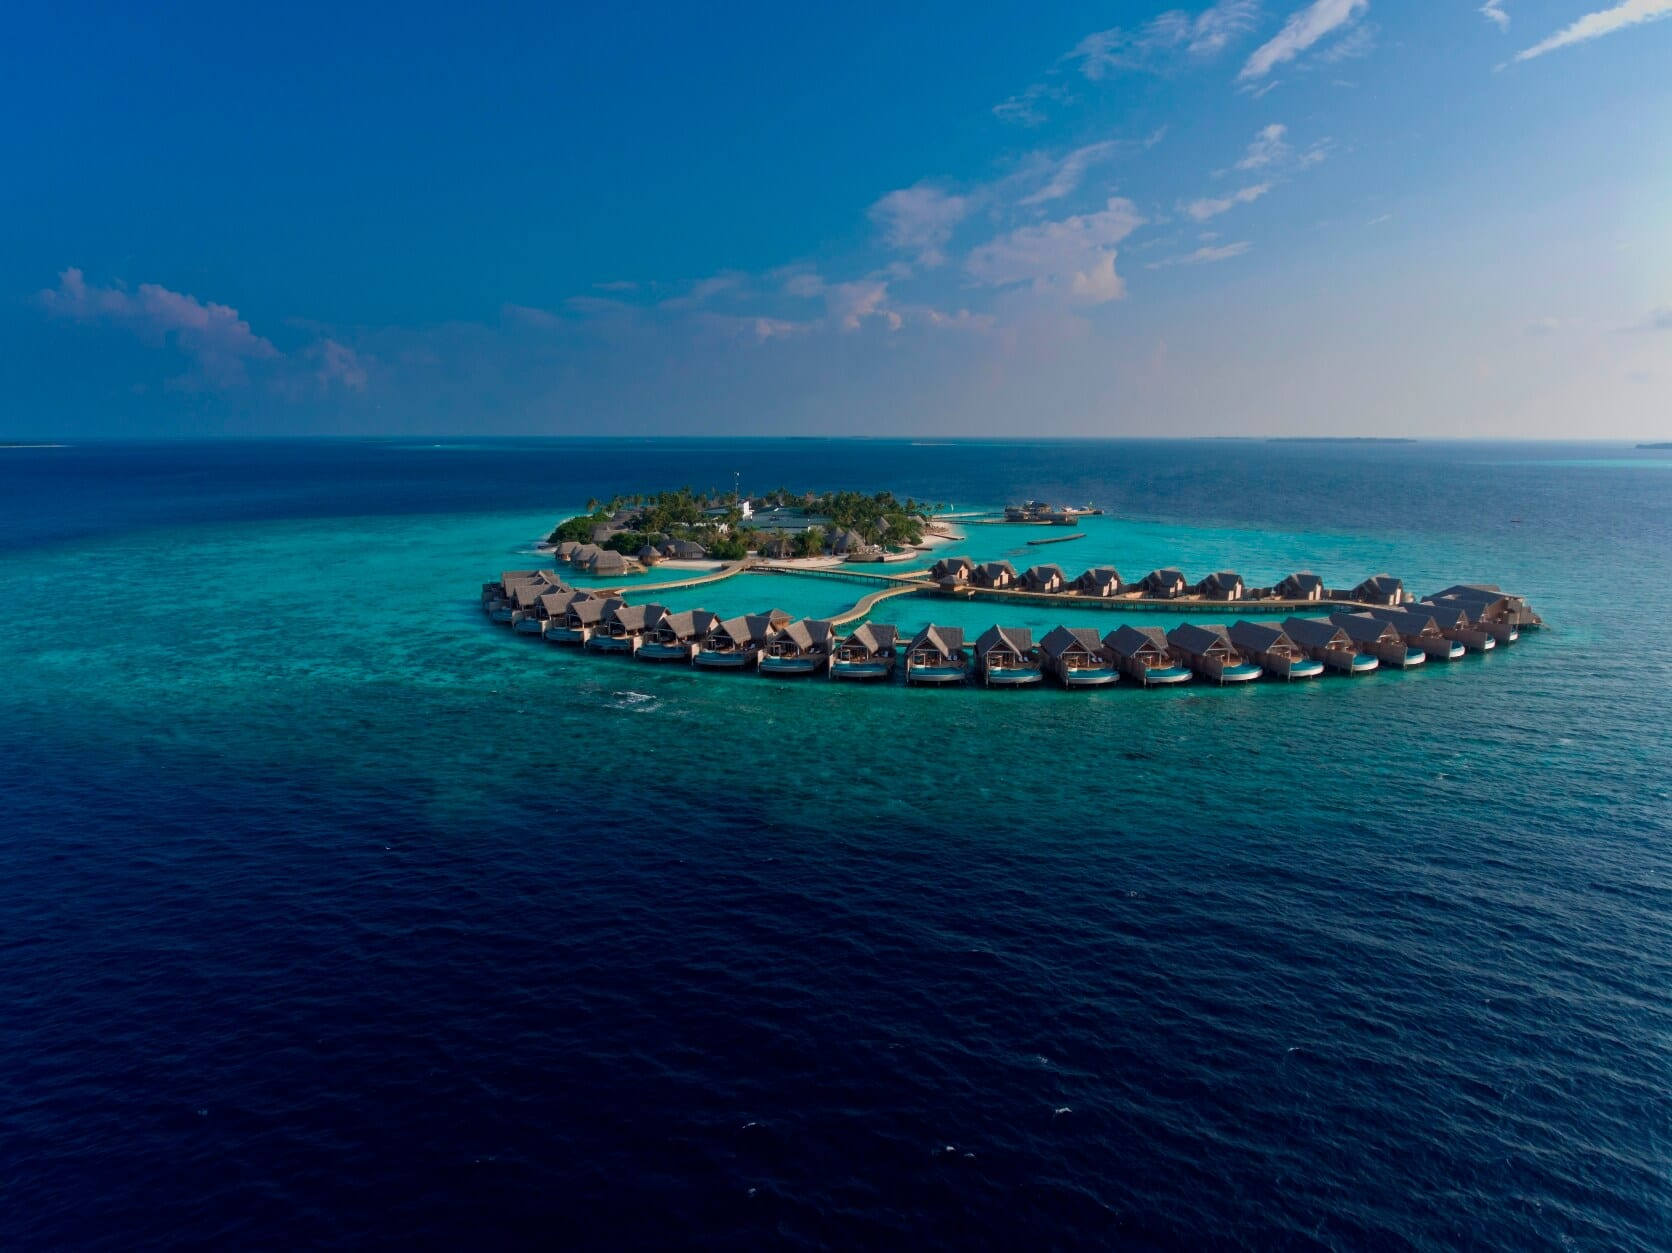 Milaidho Maldives aerial